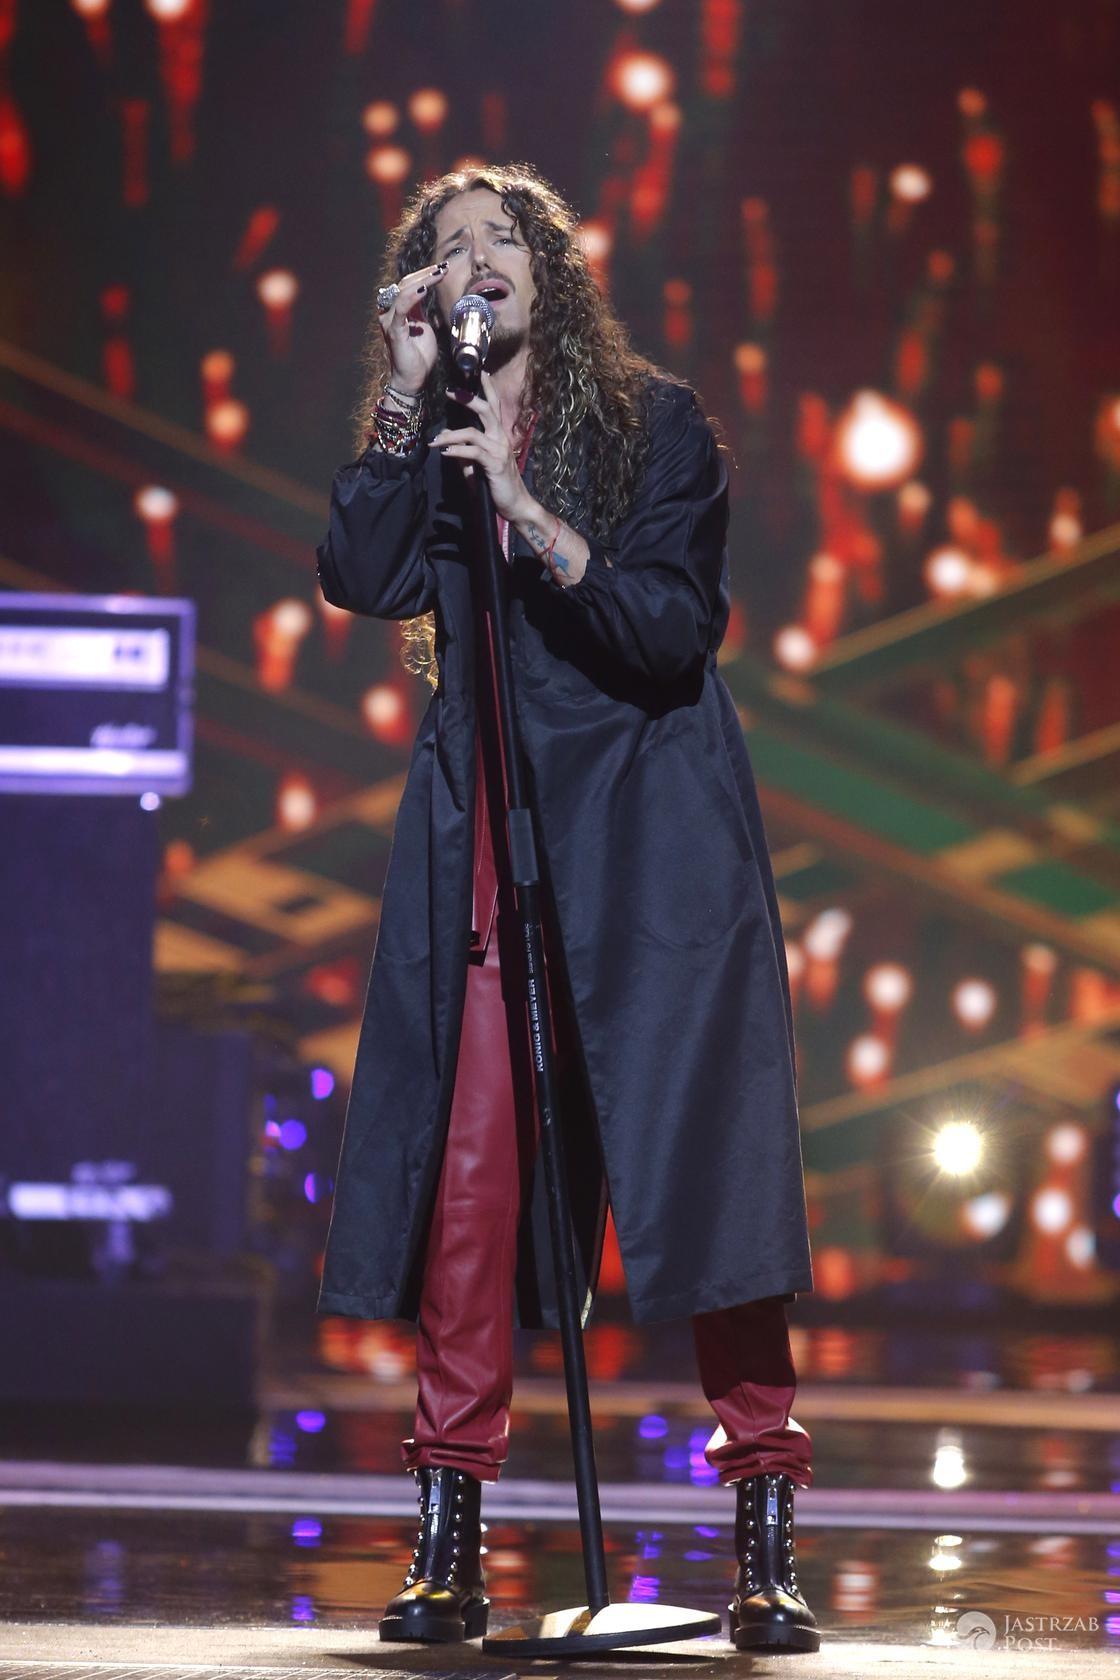 Michał Szpak - Top of The Top 2017 Sopot Festival